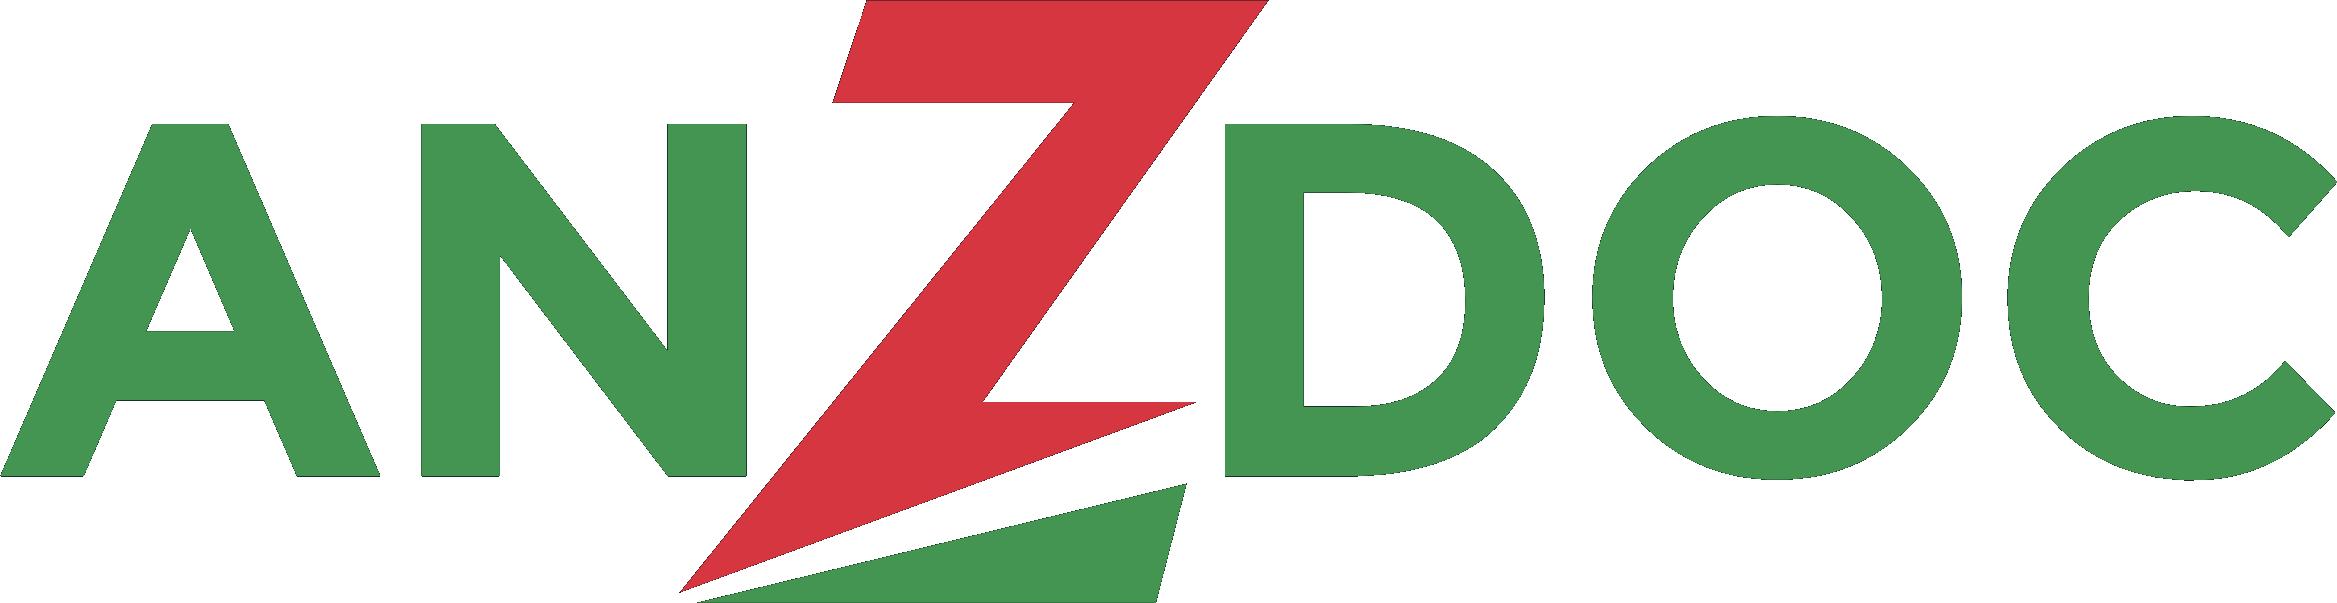 Suzuki Burgman - Index Fórum